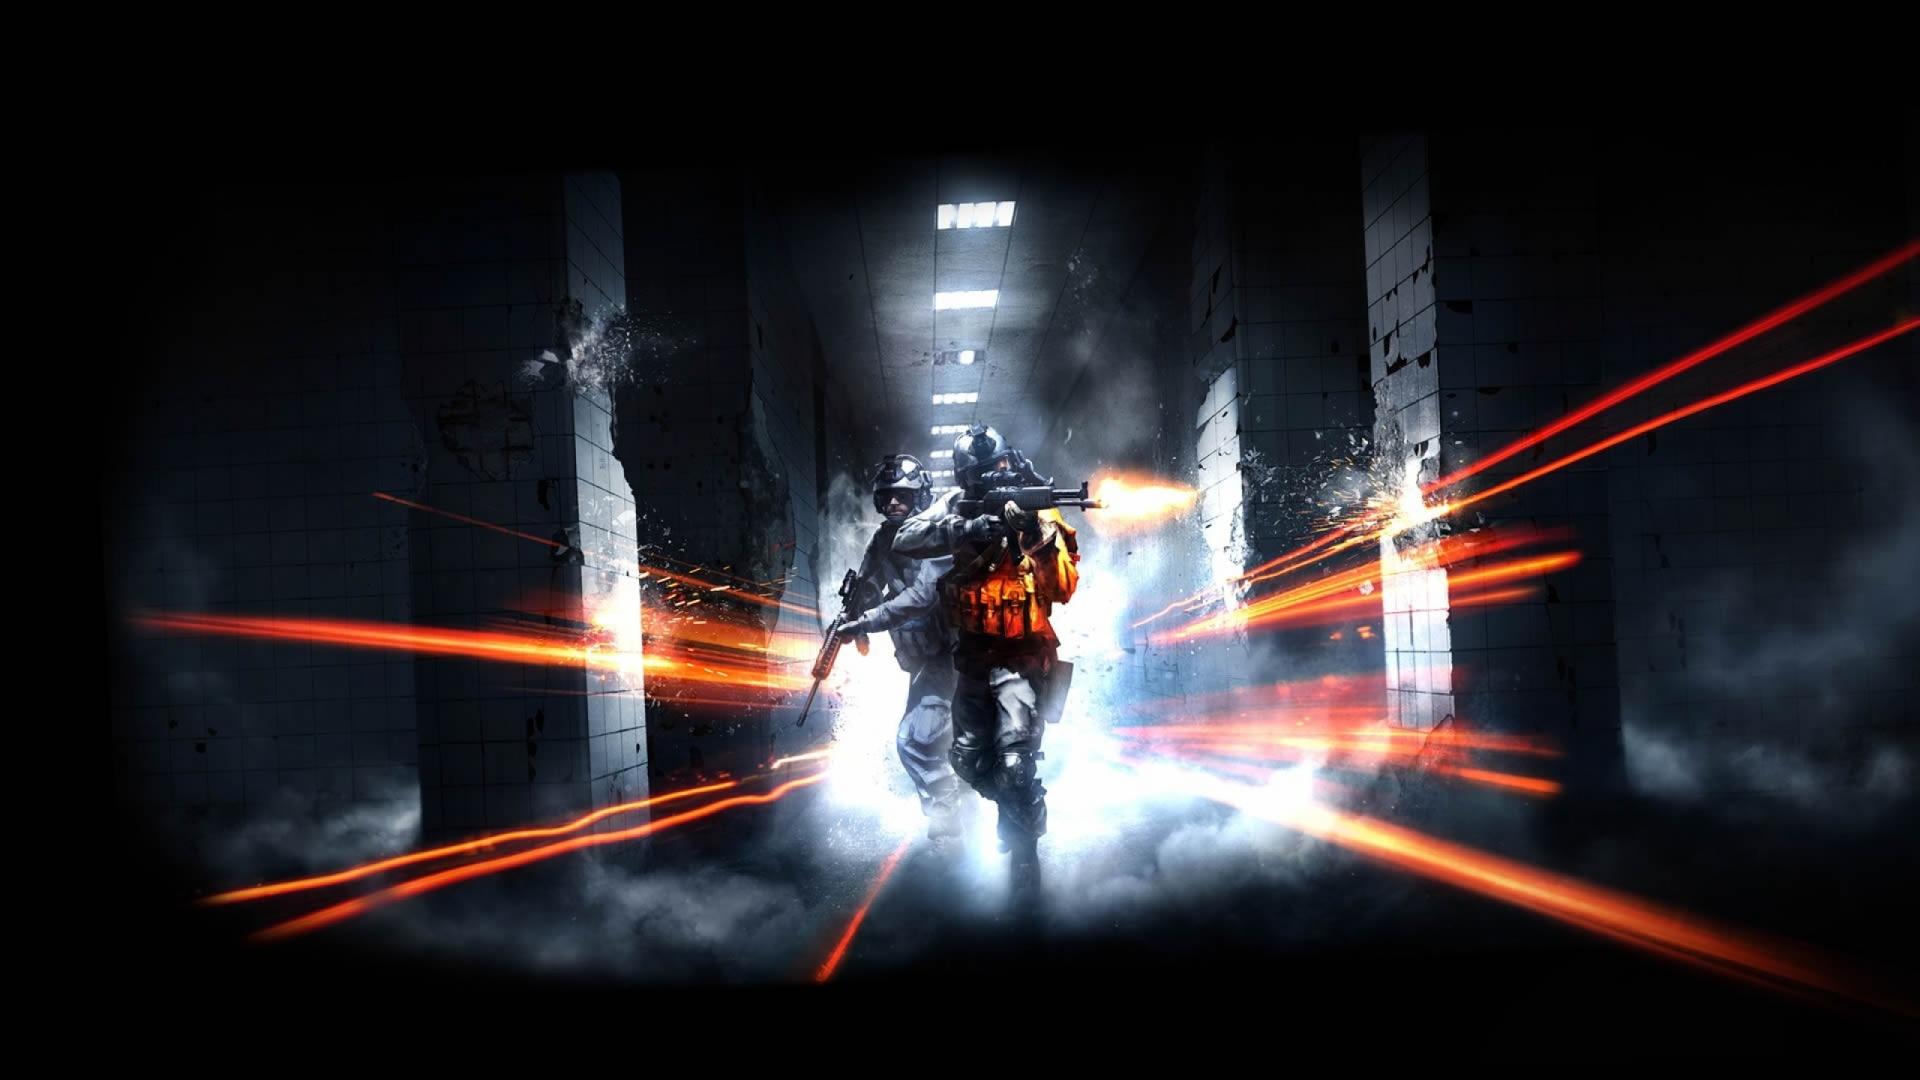 Free Download 2560x1440 Video Games Battlefield Guns Dice Shooter